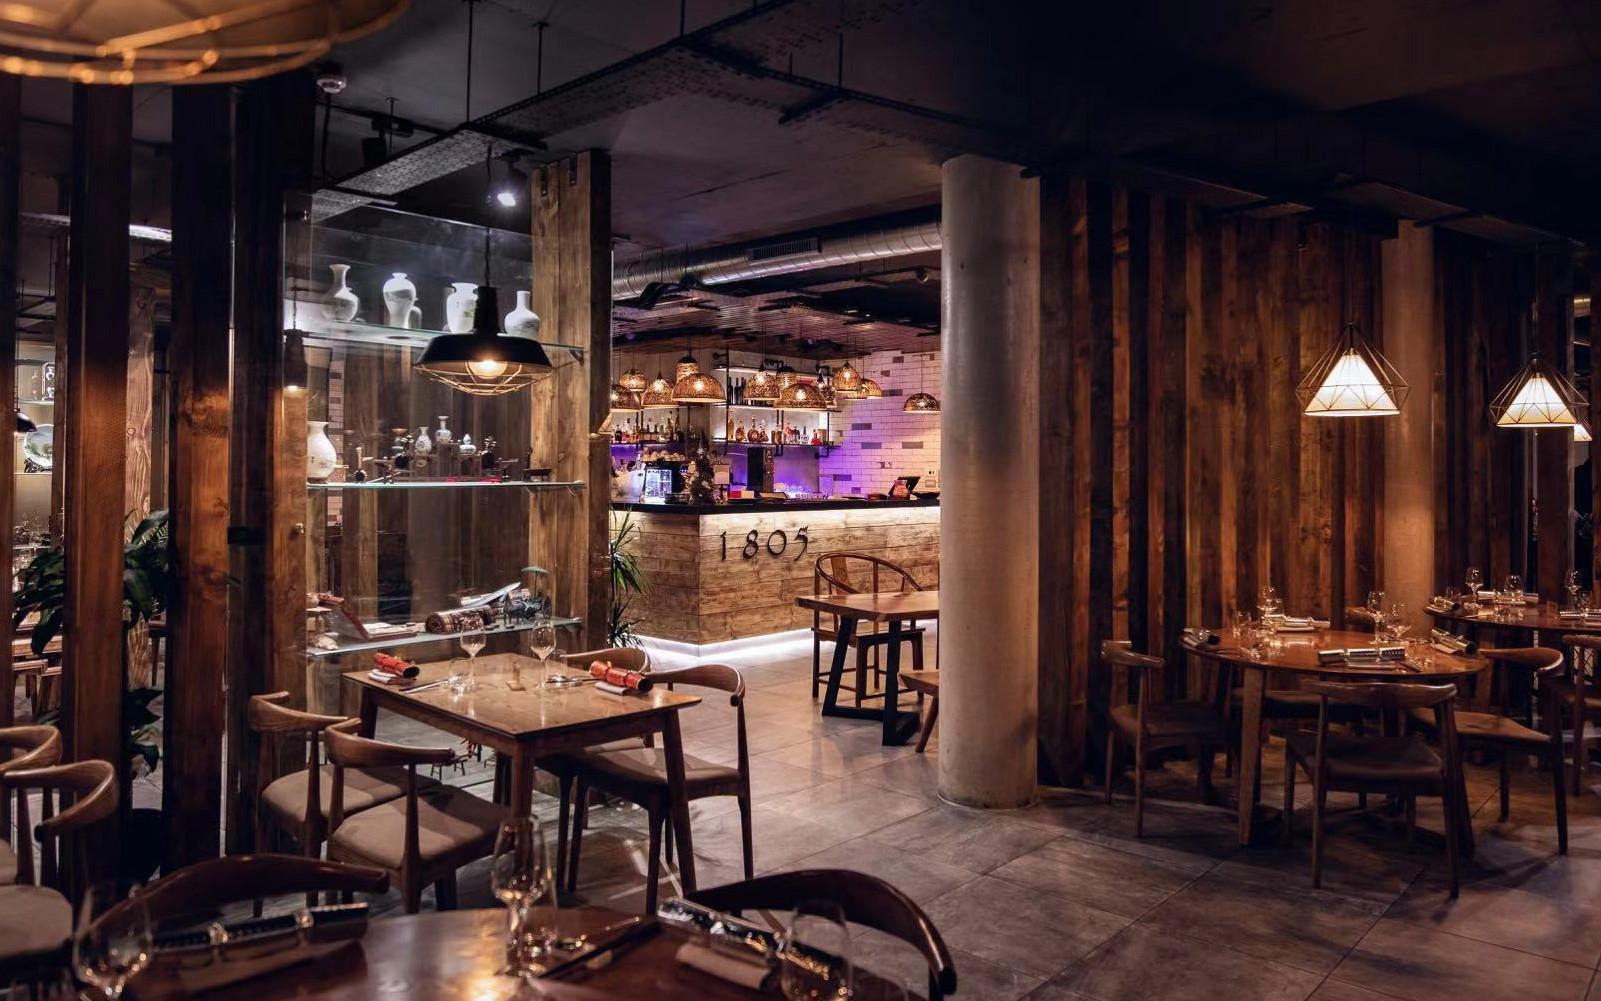 1805 Restaurant